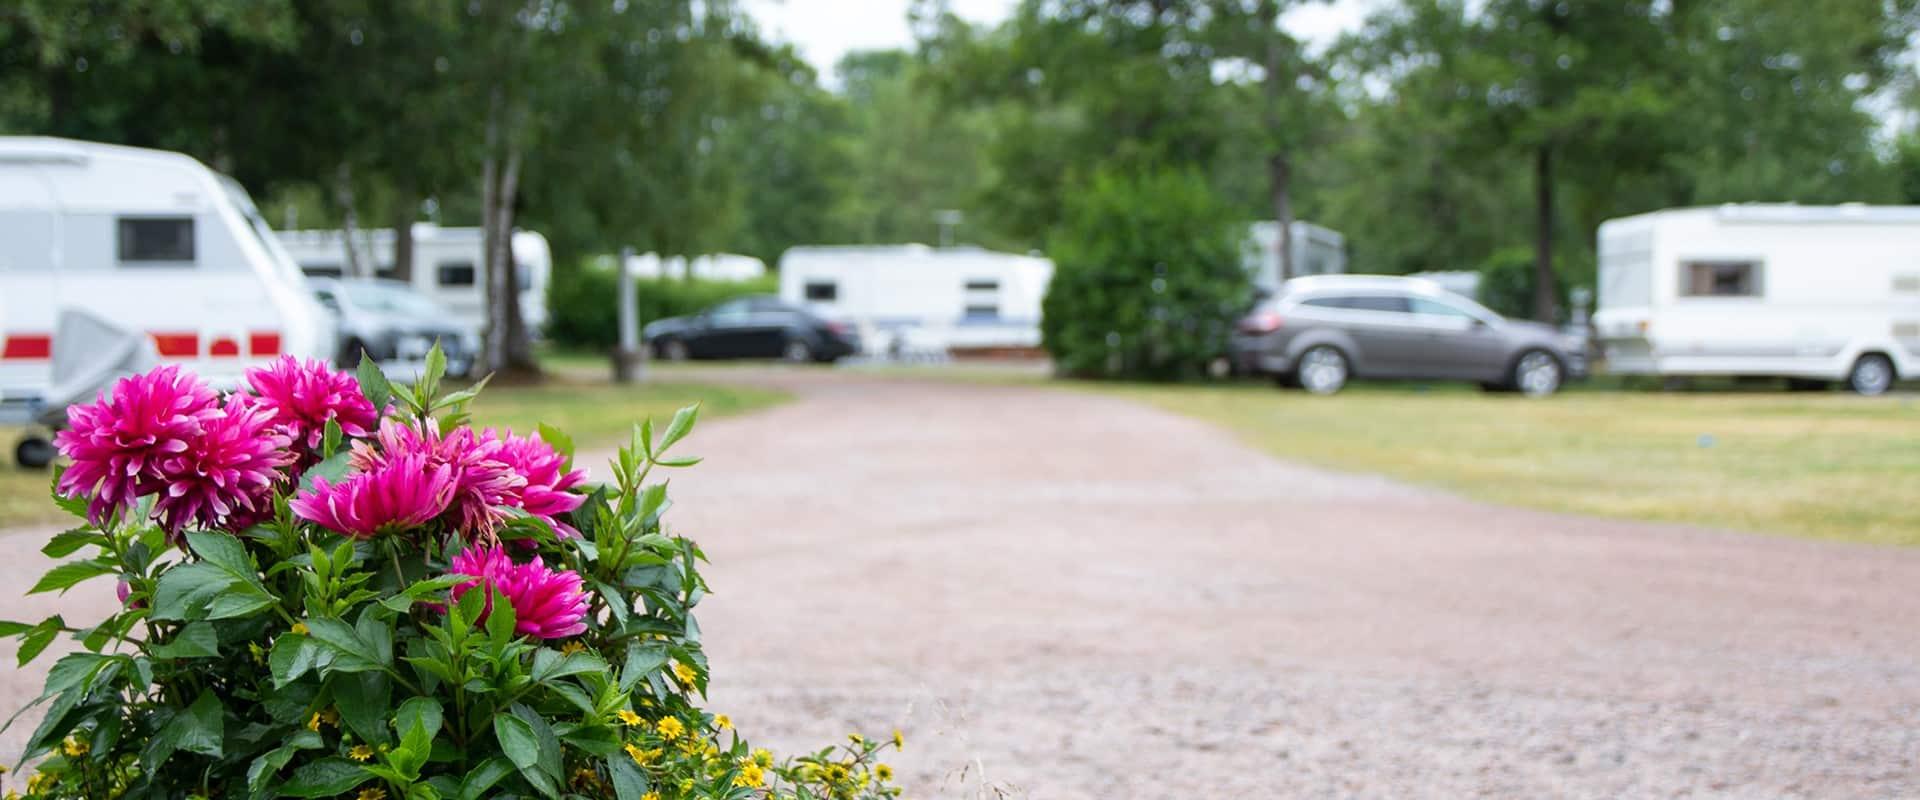 Visit Häme - Leirintä, Caravan, Camping